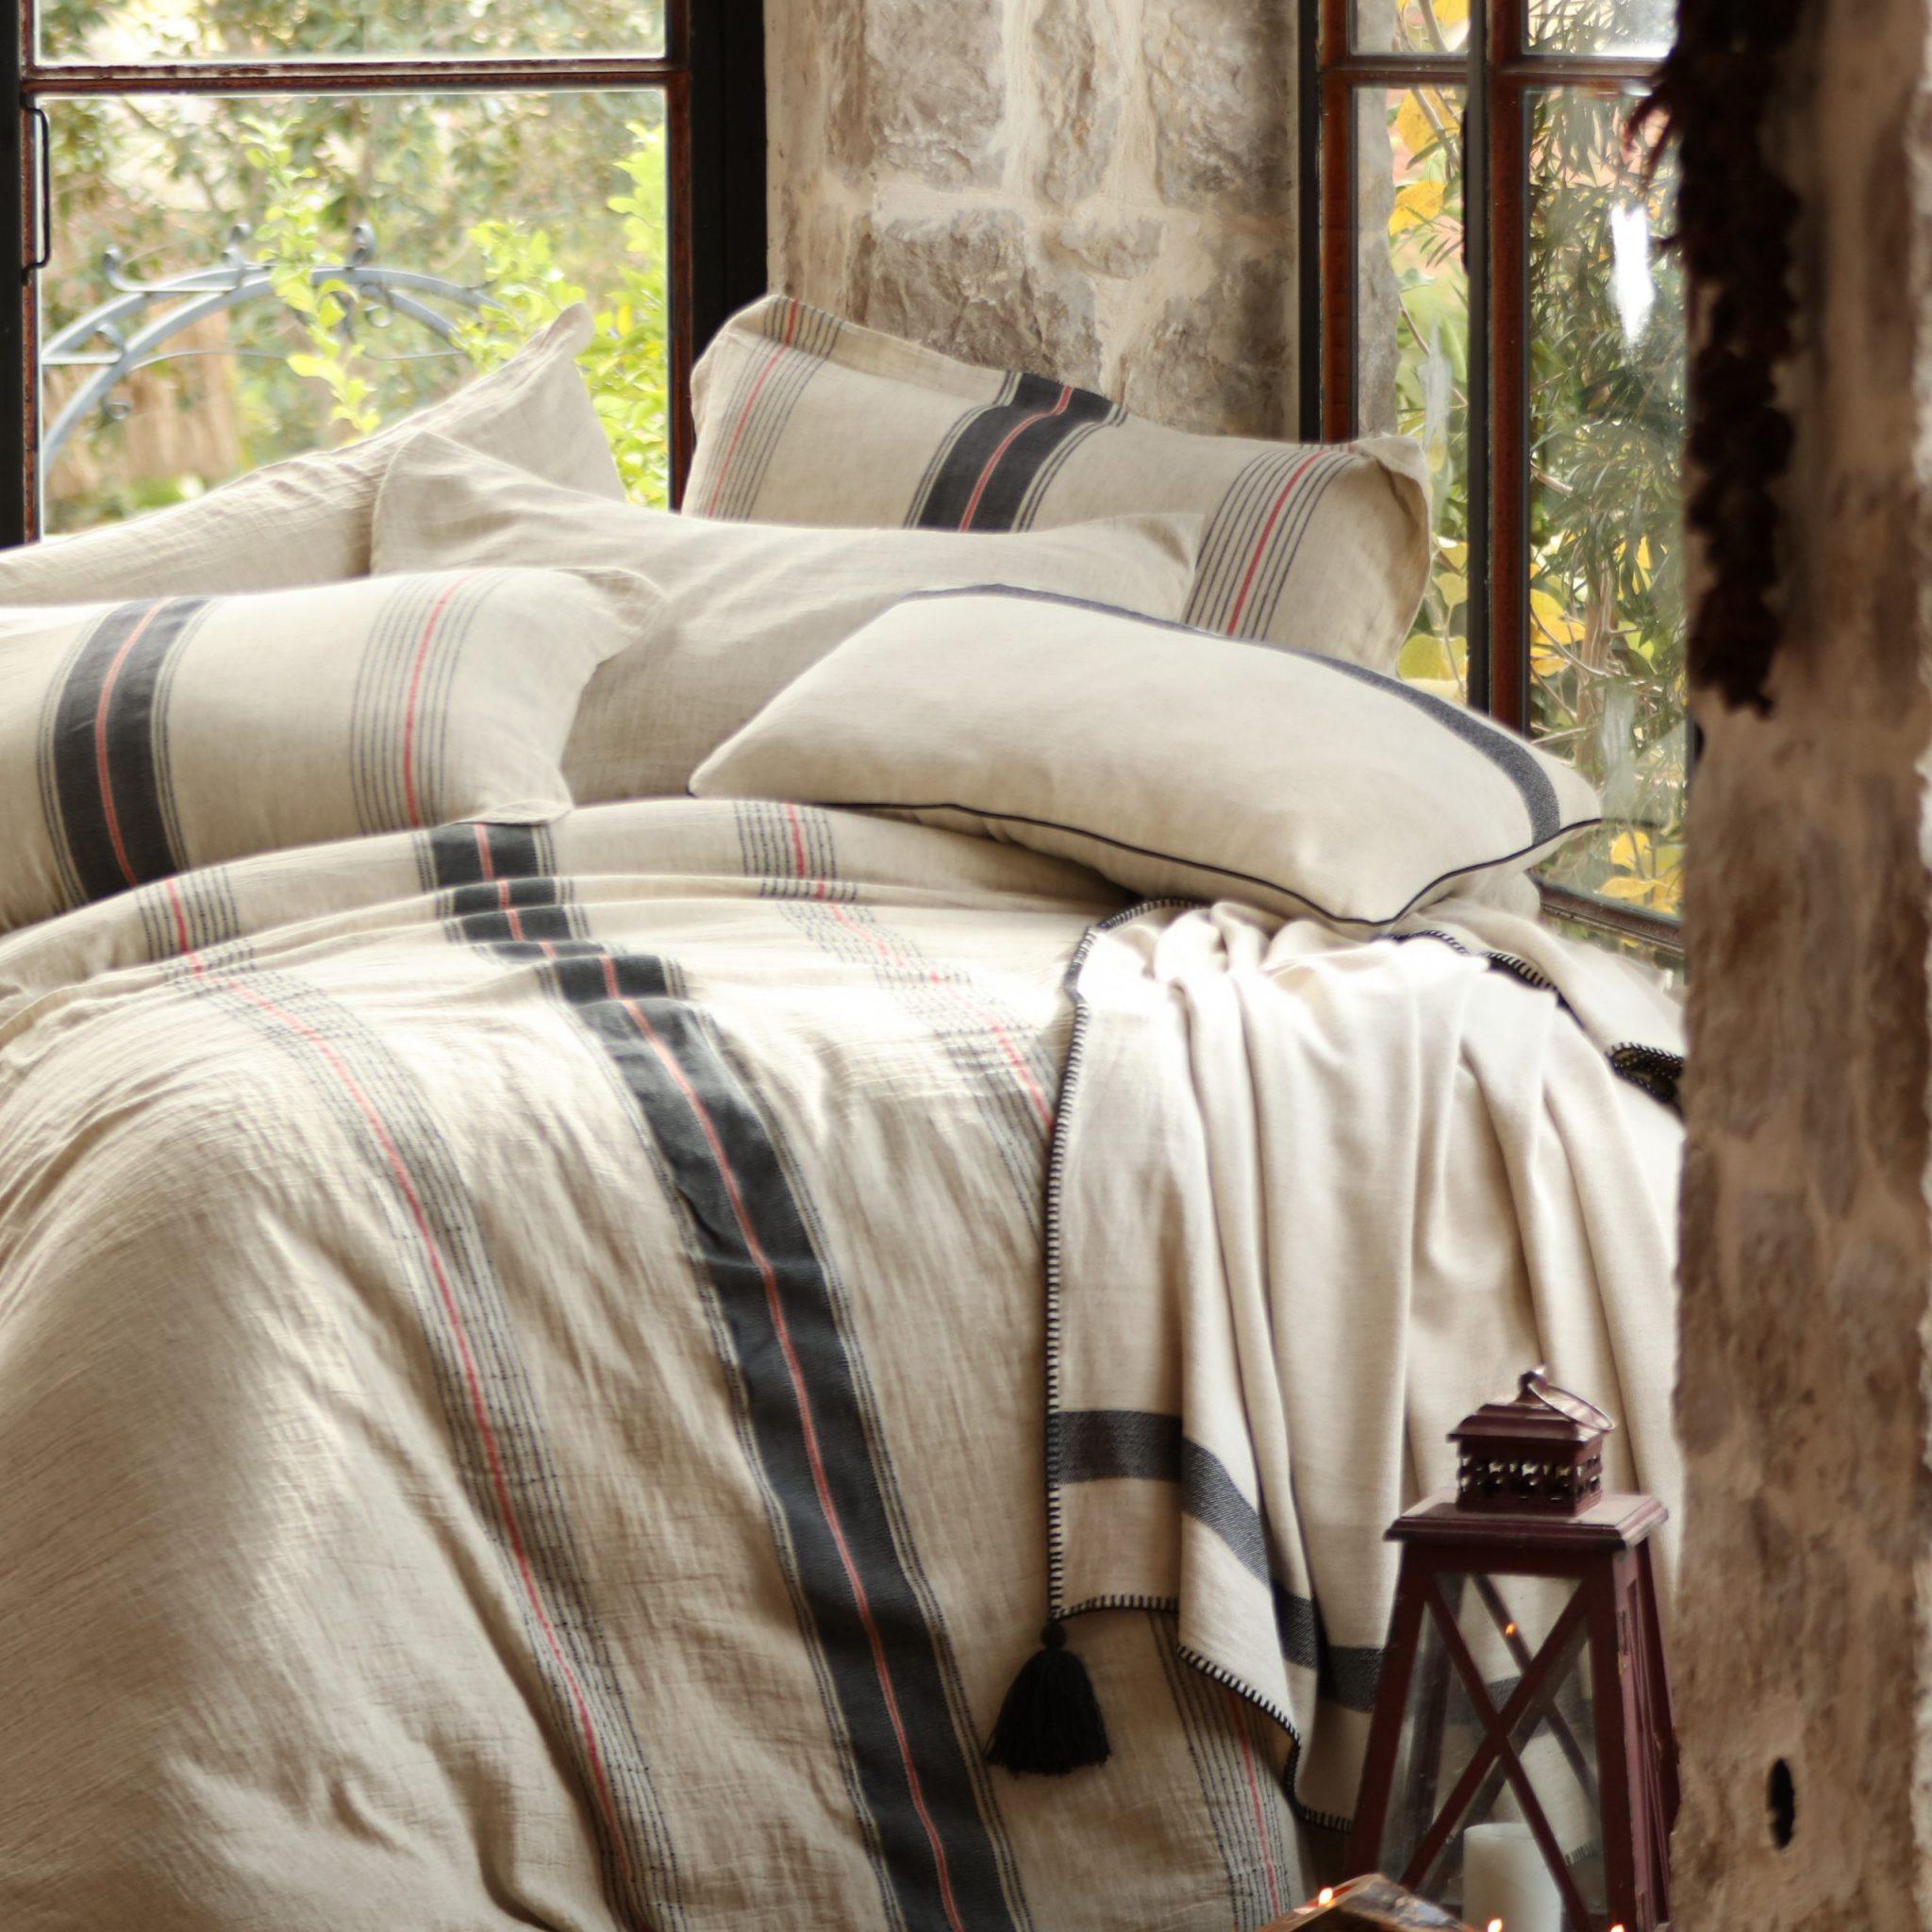 Plaid bed